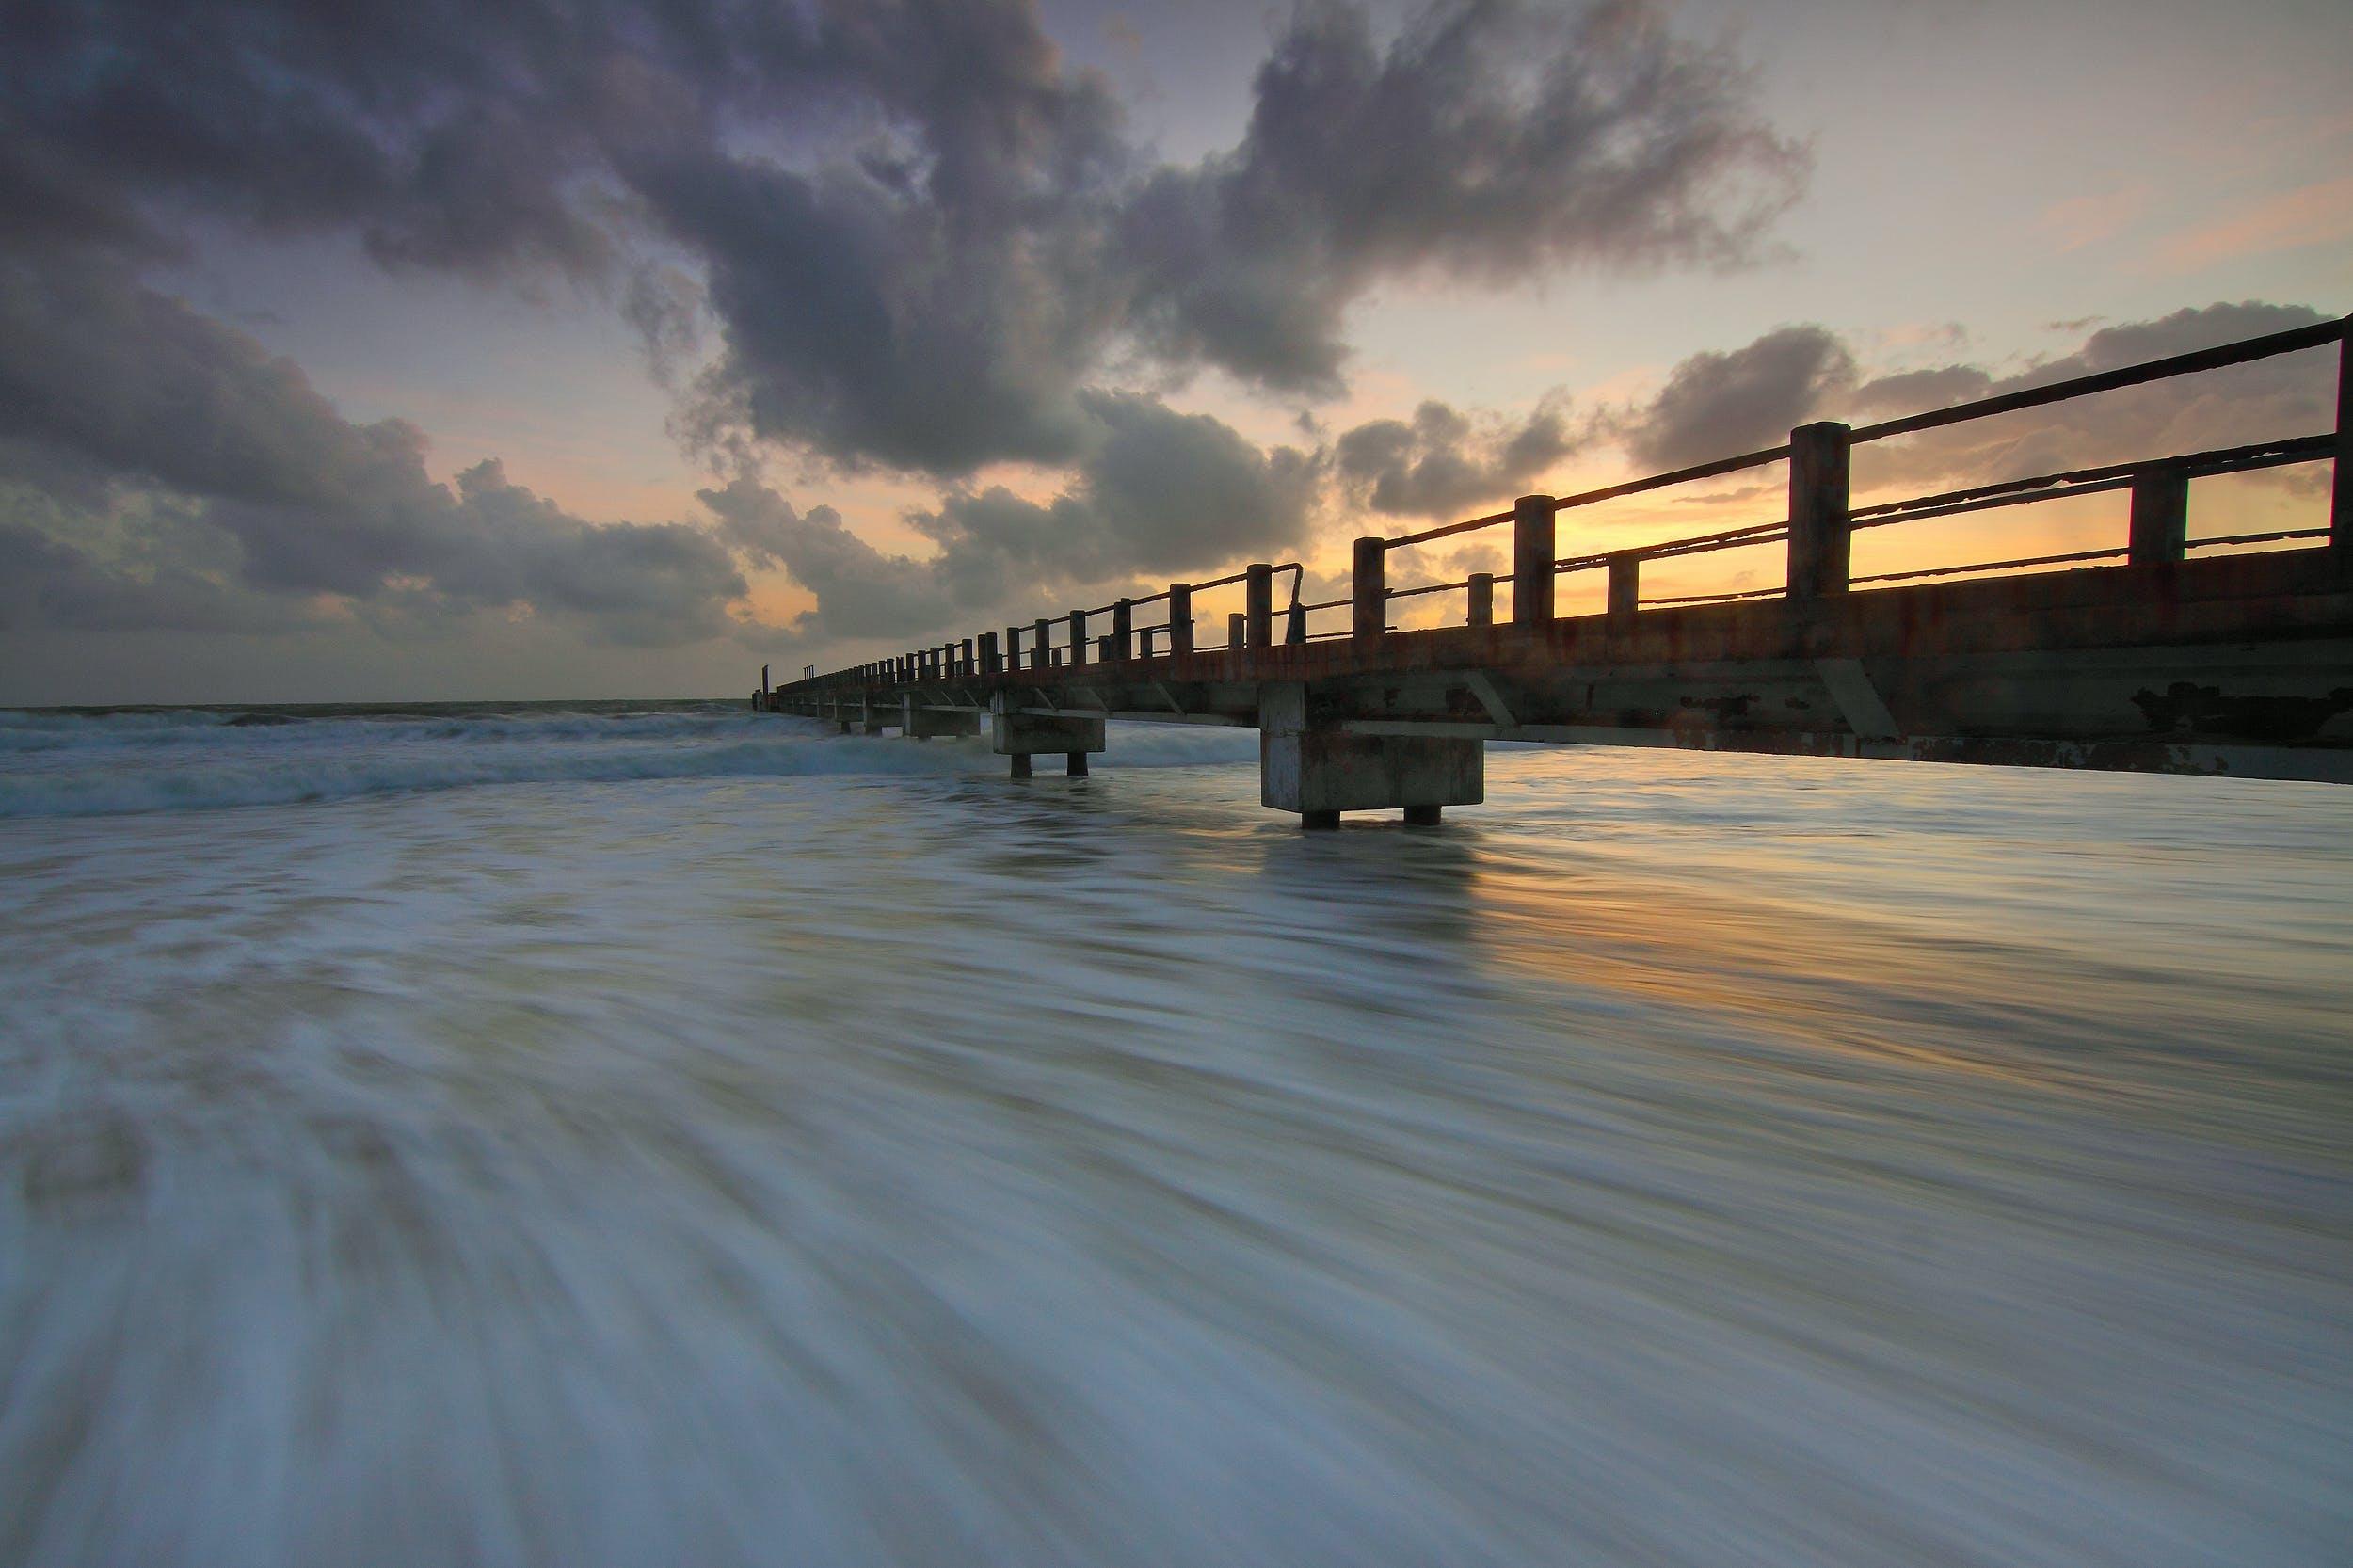 Brown Wooden Fishing Dock on Ocean